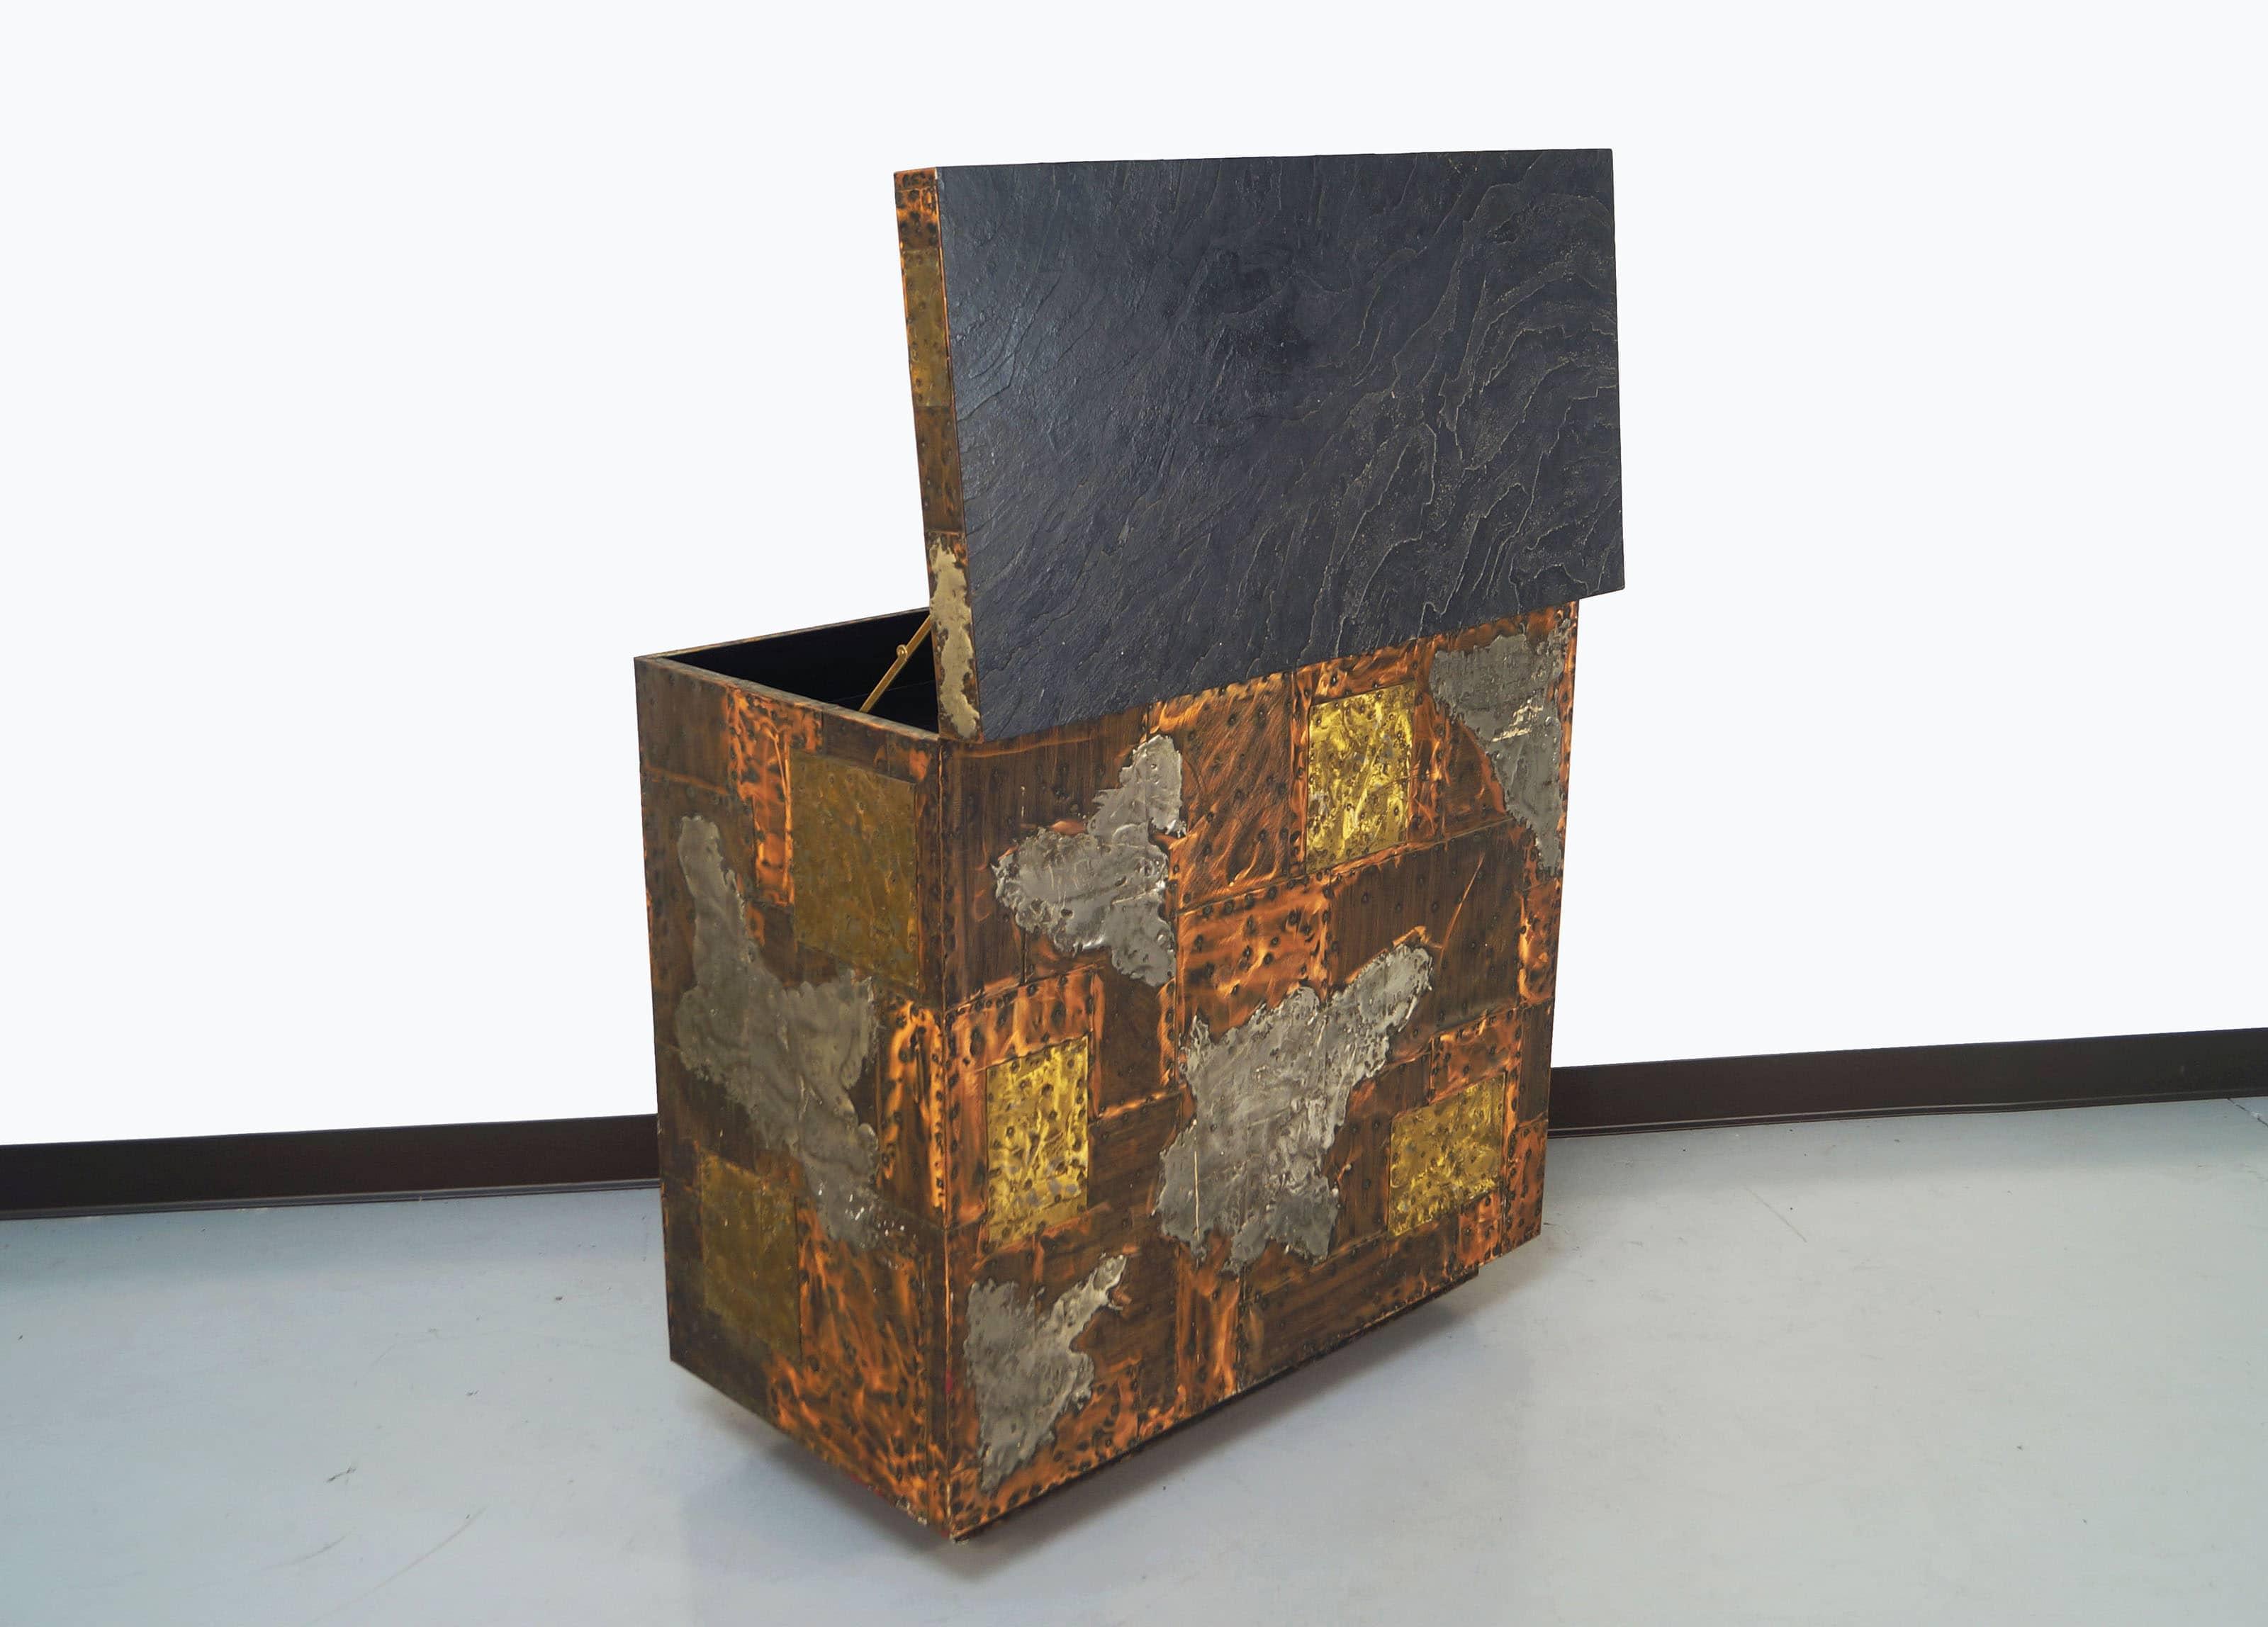 Exceptional Patchwork Flip- Top Bar Cabinet by Paul Evans